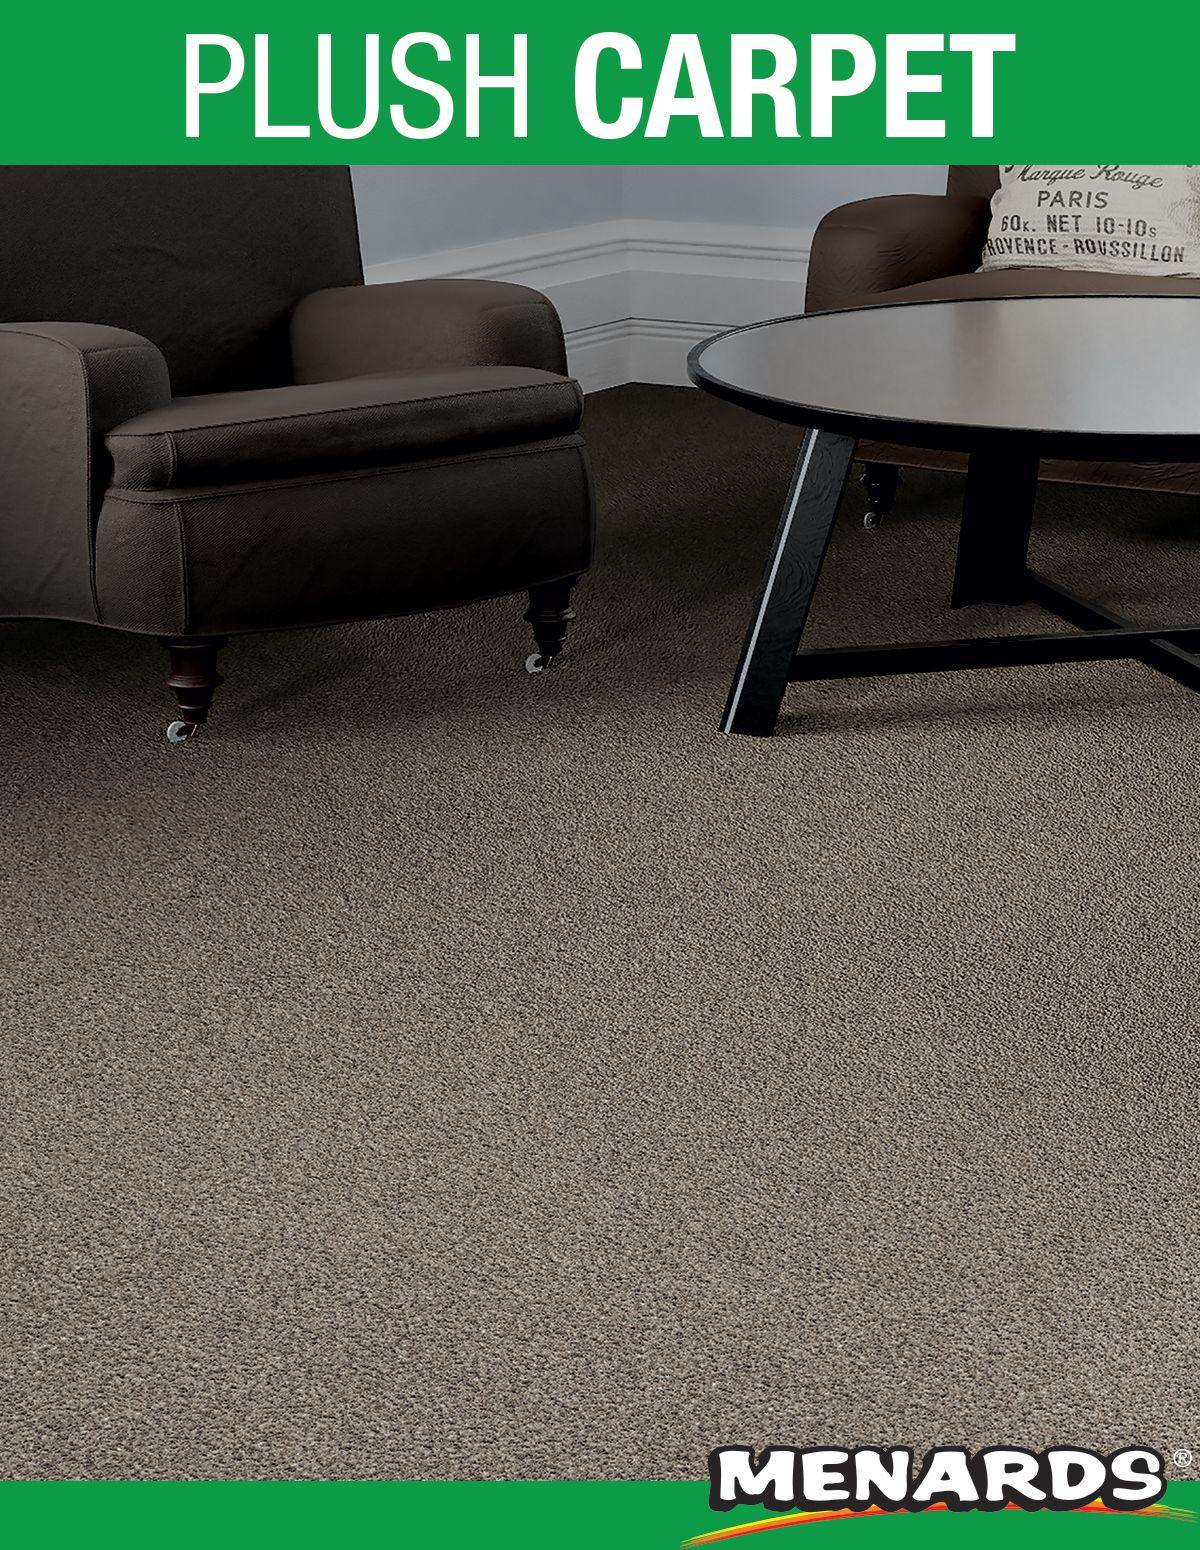 Looptex Mills Beacon Plush Carpet 12 Ft Wide In 2020 Plush Carpet Comforters Cozy Carpet